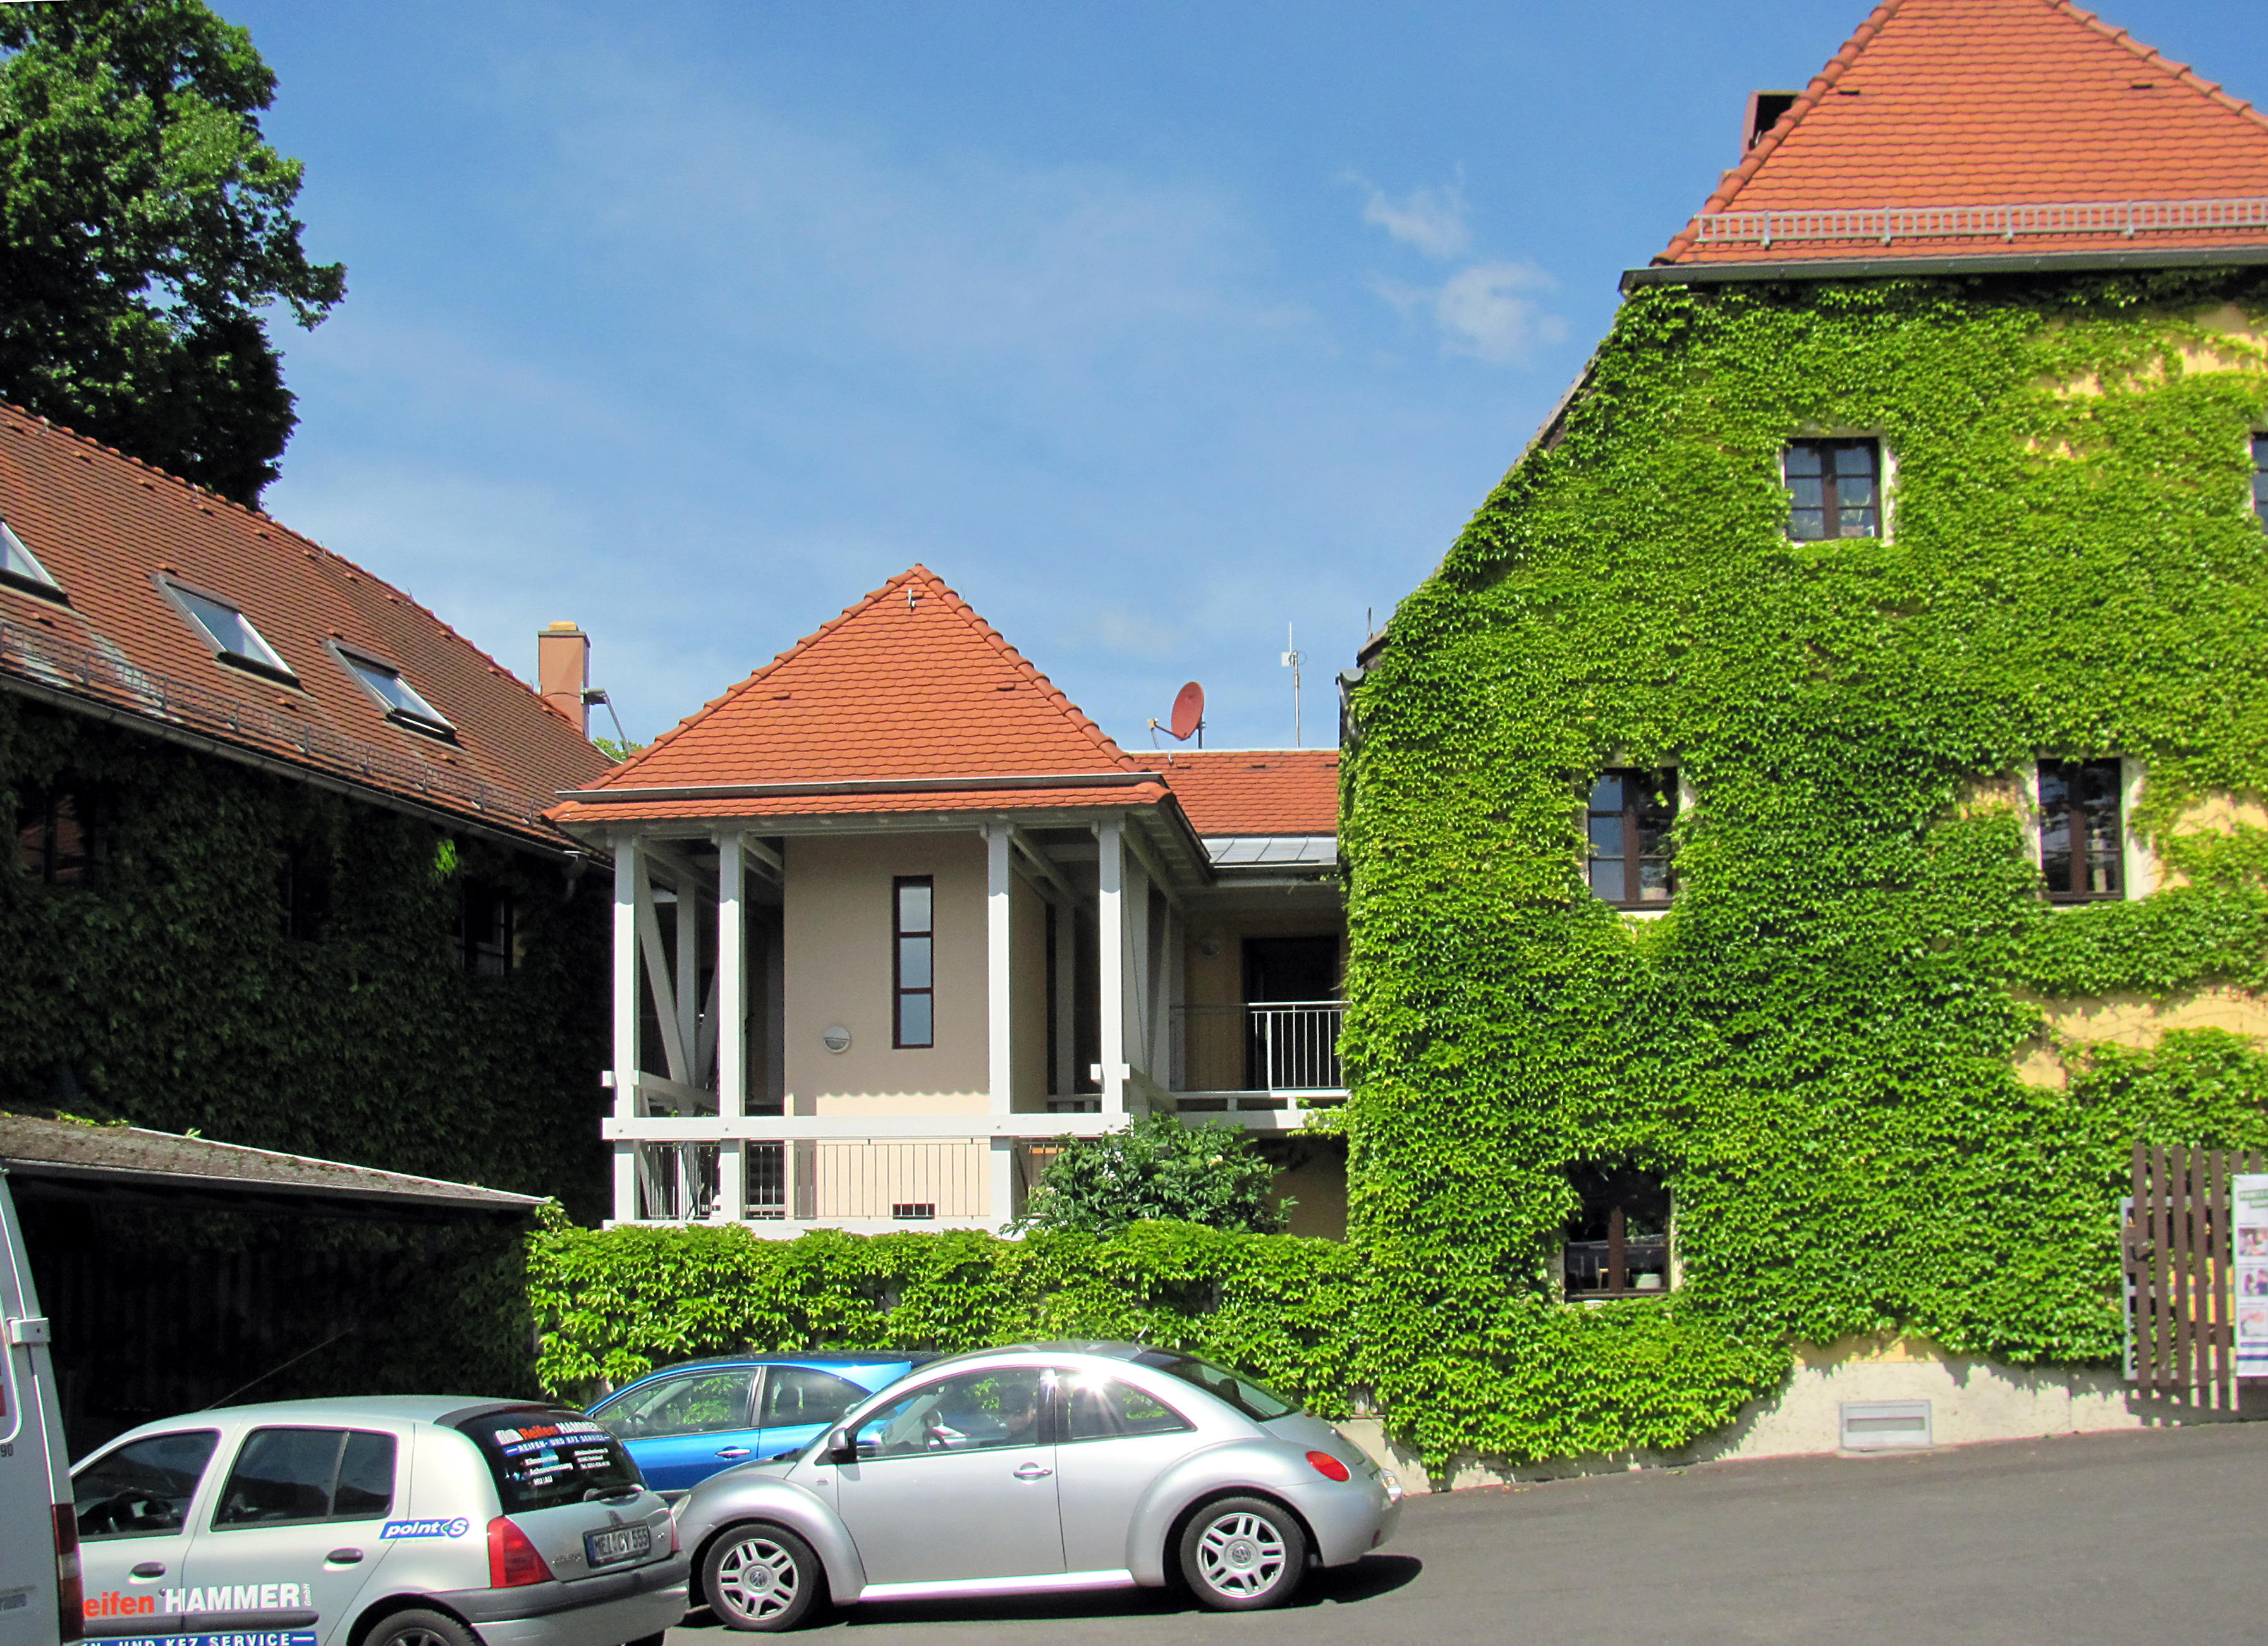 Datei:Kötzschenbroda Oberschänke Innenhof.JPG – Wikipedia